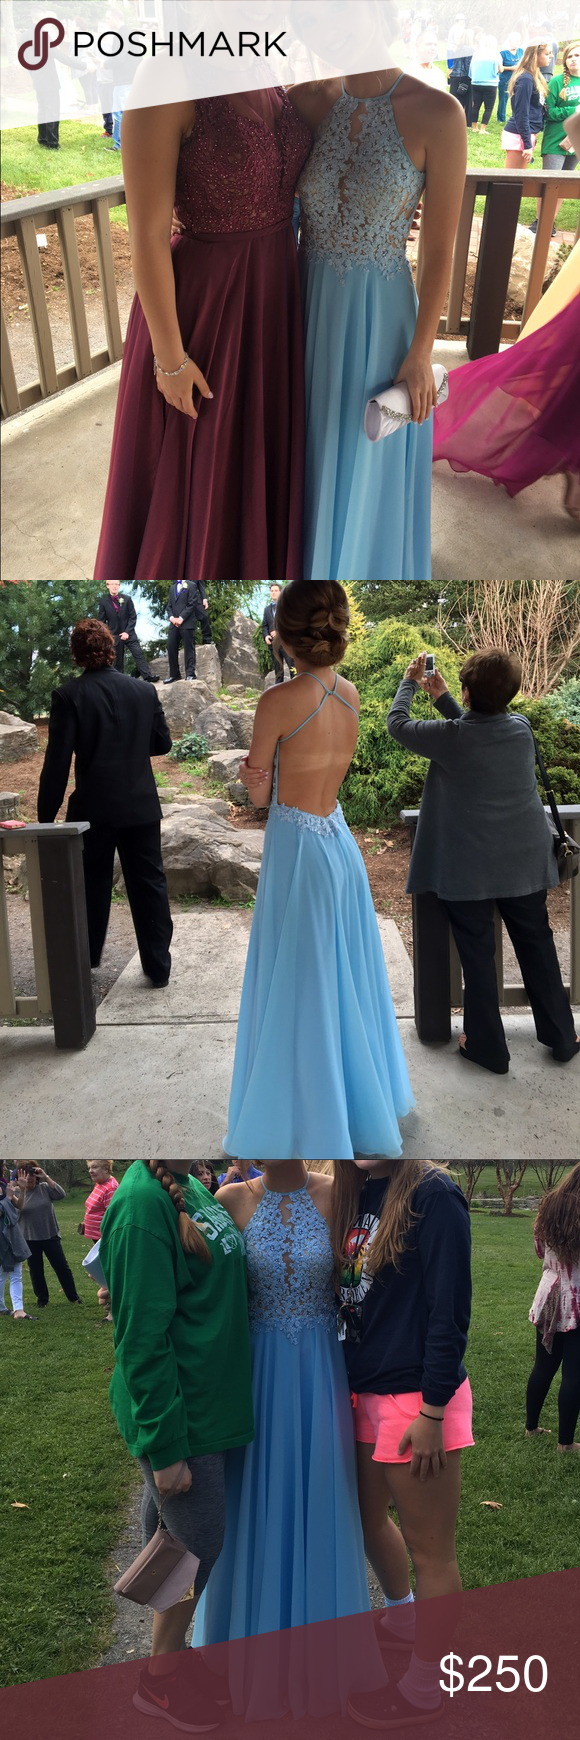 Selling this light blue halter prom dress size on poshmark my